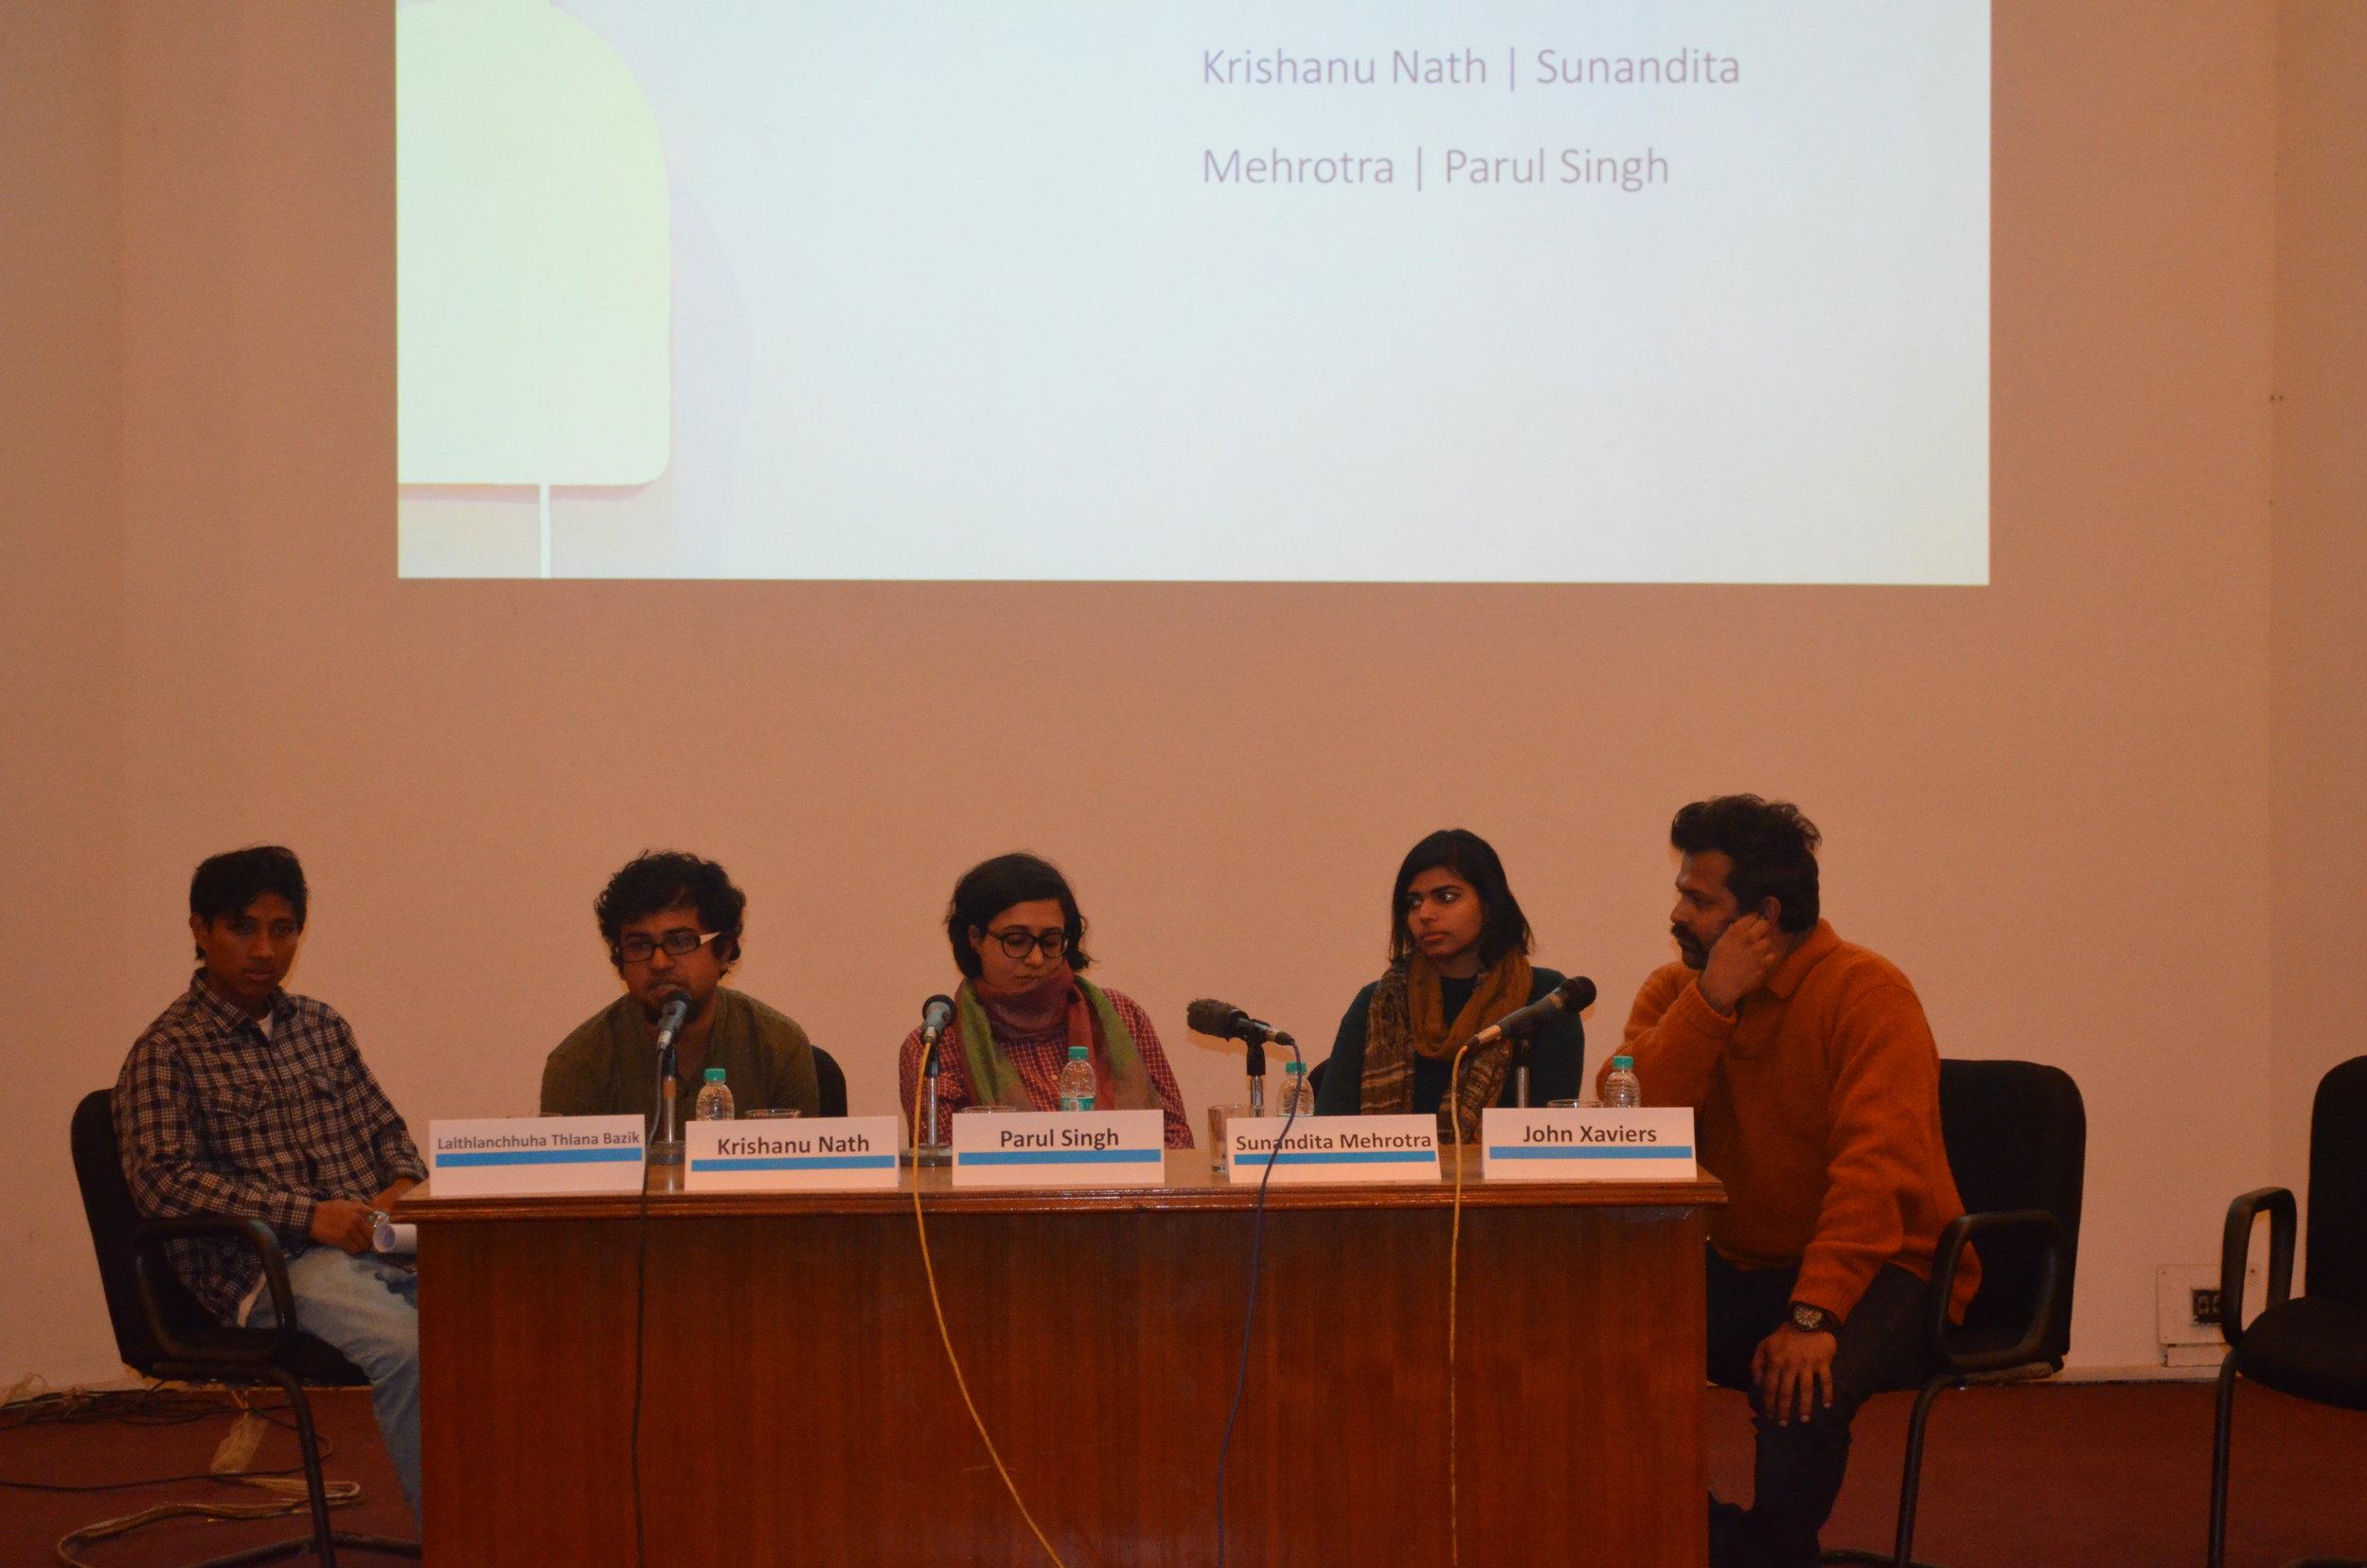 'When Does Curatorial Work End?' with Laithianchhuha Thlana Bazik, Krishanu Nath, Parul Singh, Sunandita Mehrotra and John Xaviers.